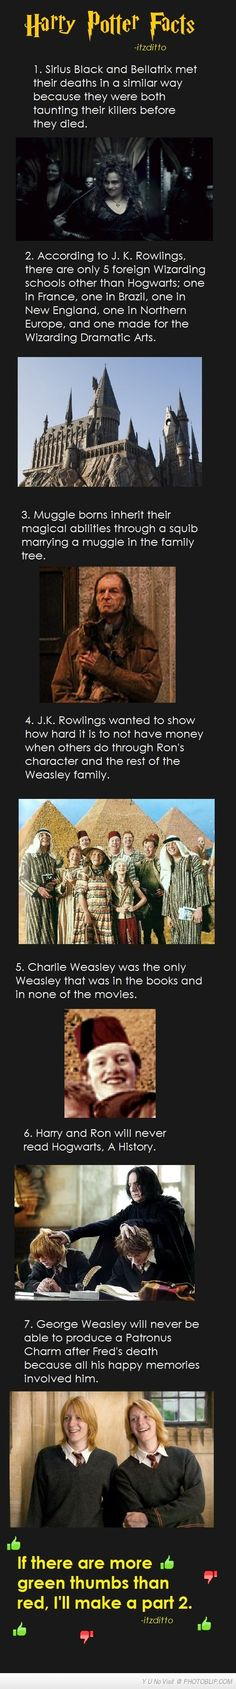 Harry Potter Facts Part 1